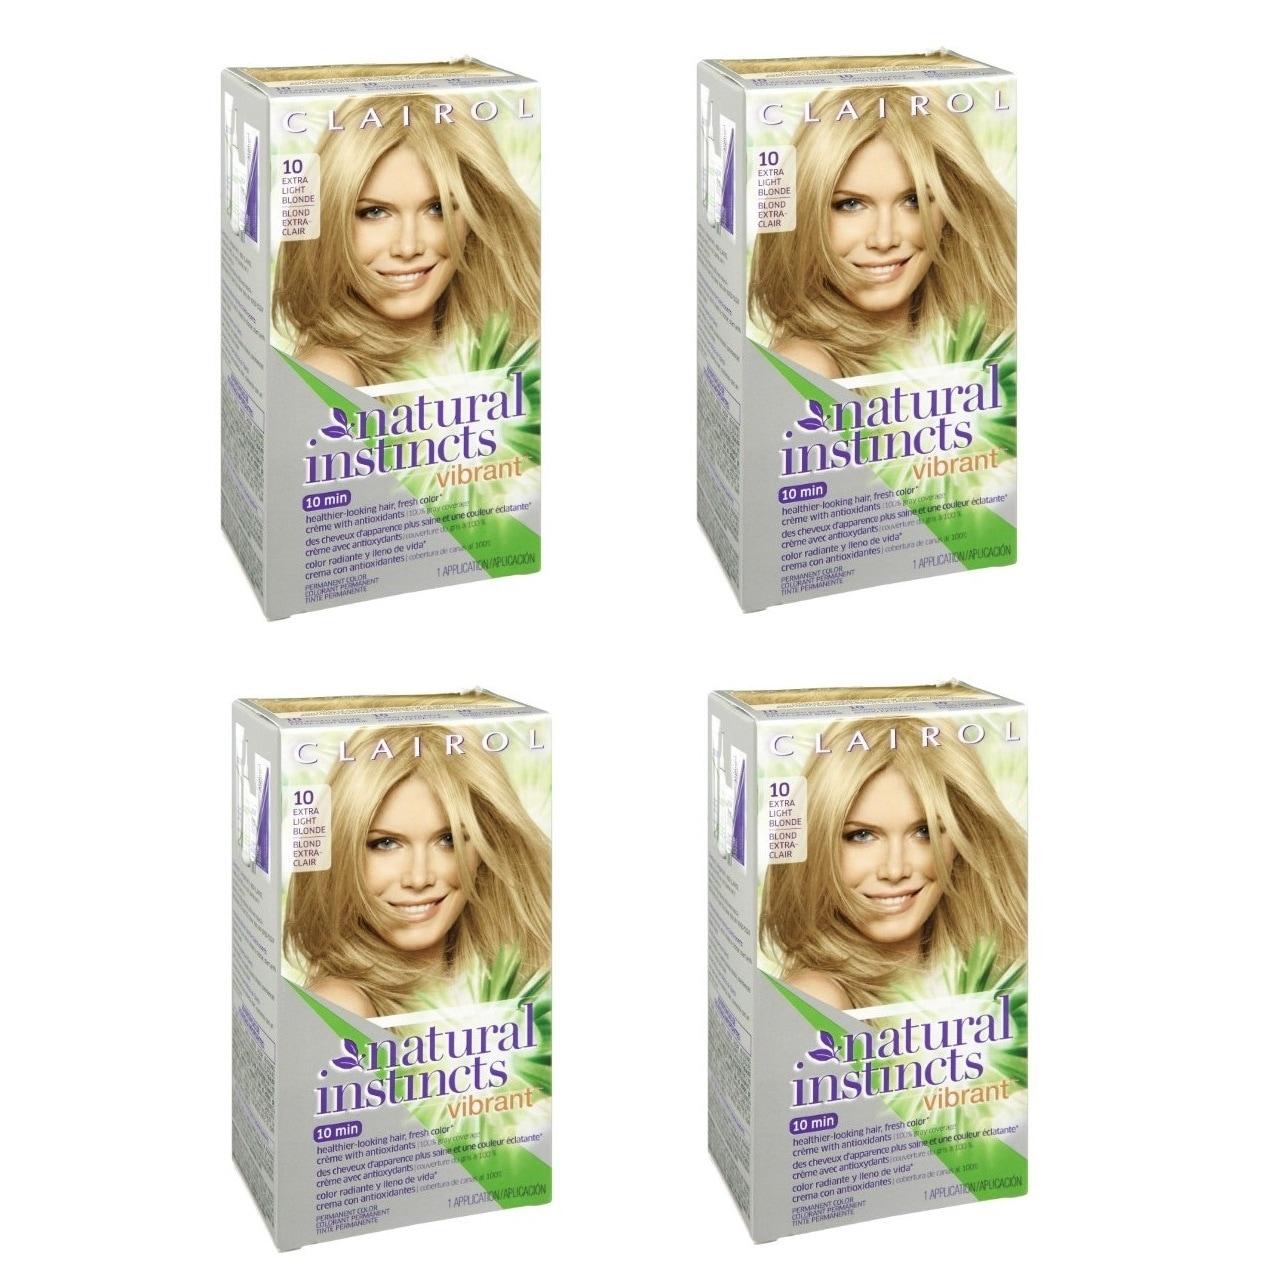 Shop Clairol Natural Instincts Vibrant 10 Extra Light Blonde